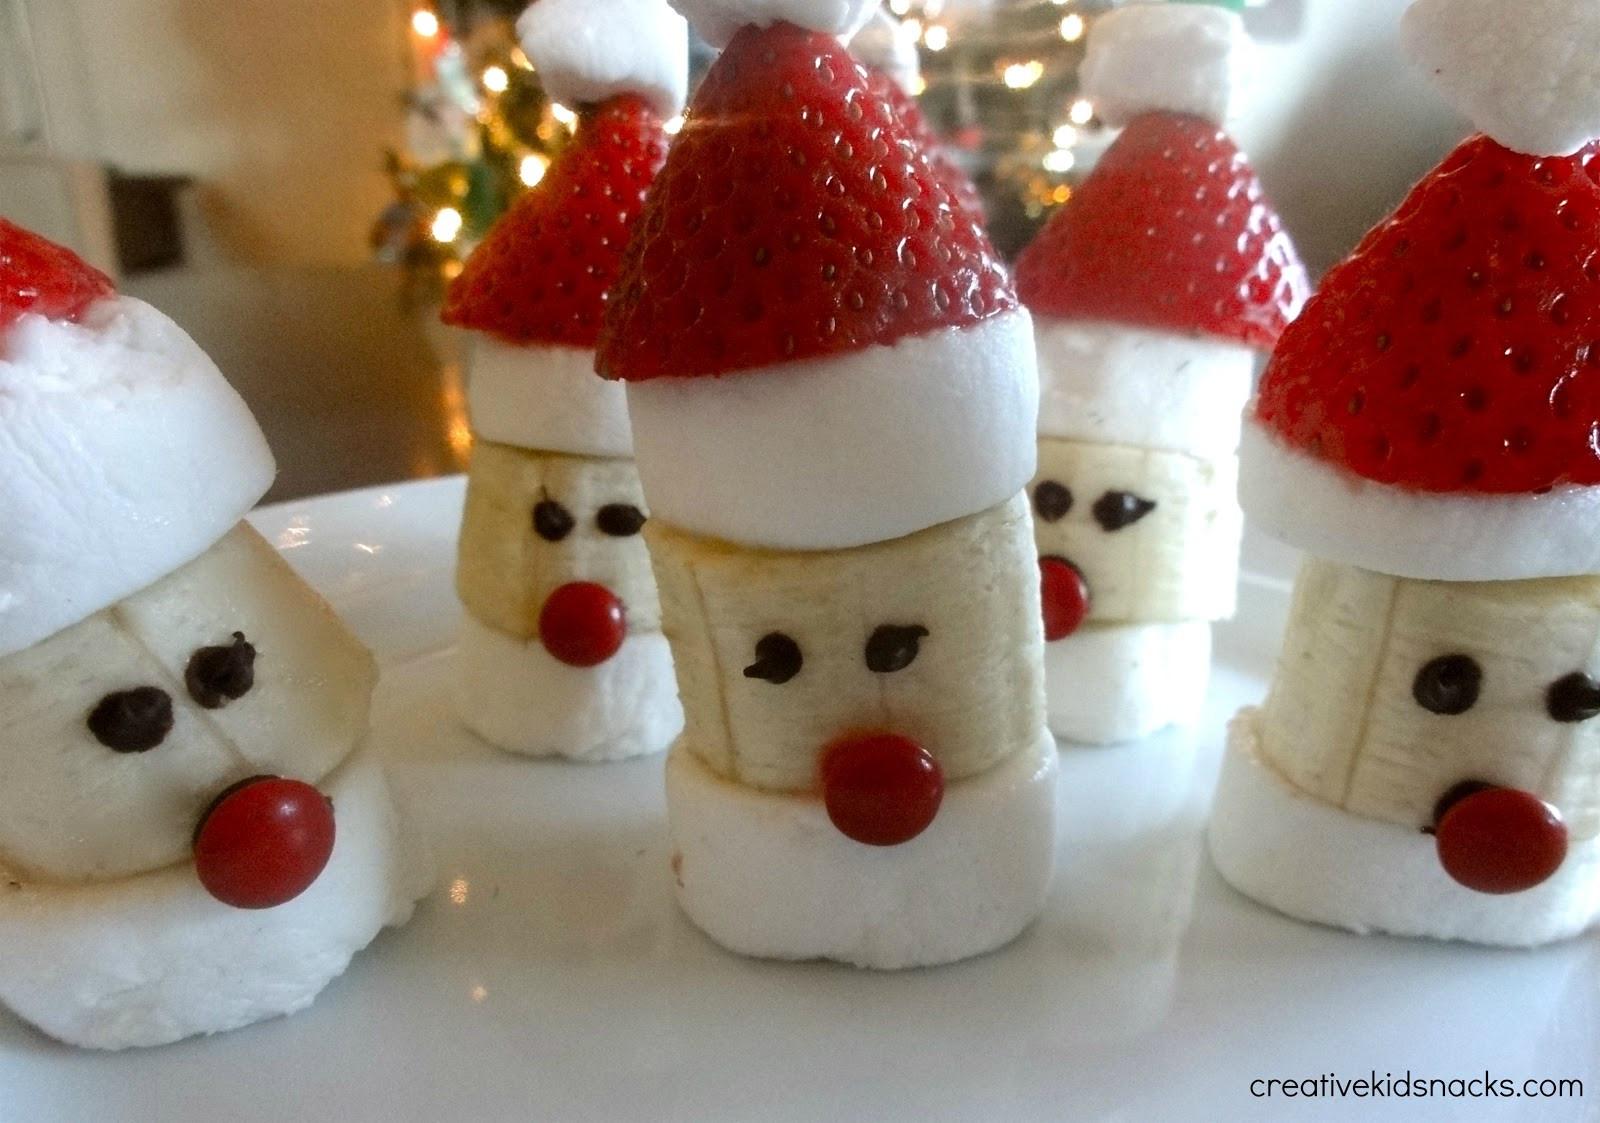 Healthy Christmas Party Snacks  Creative Kid Snacks